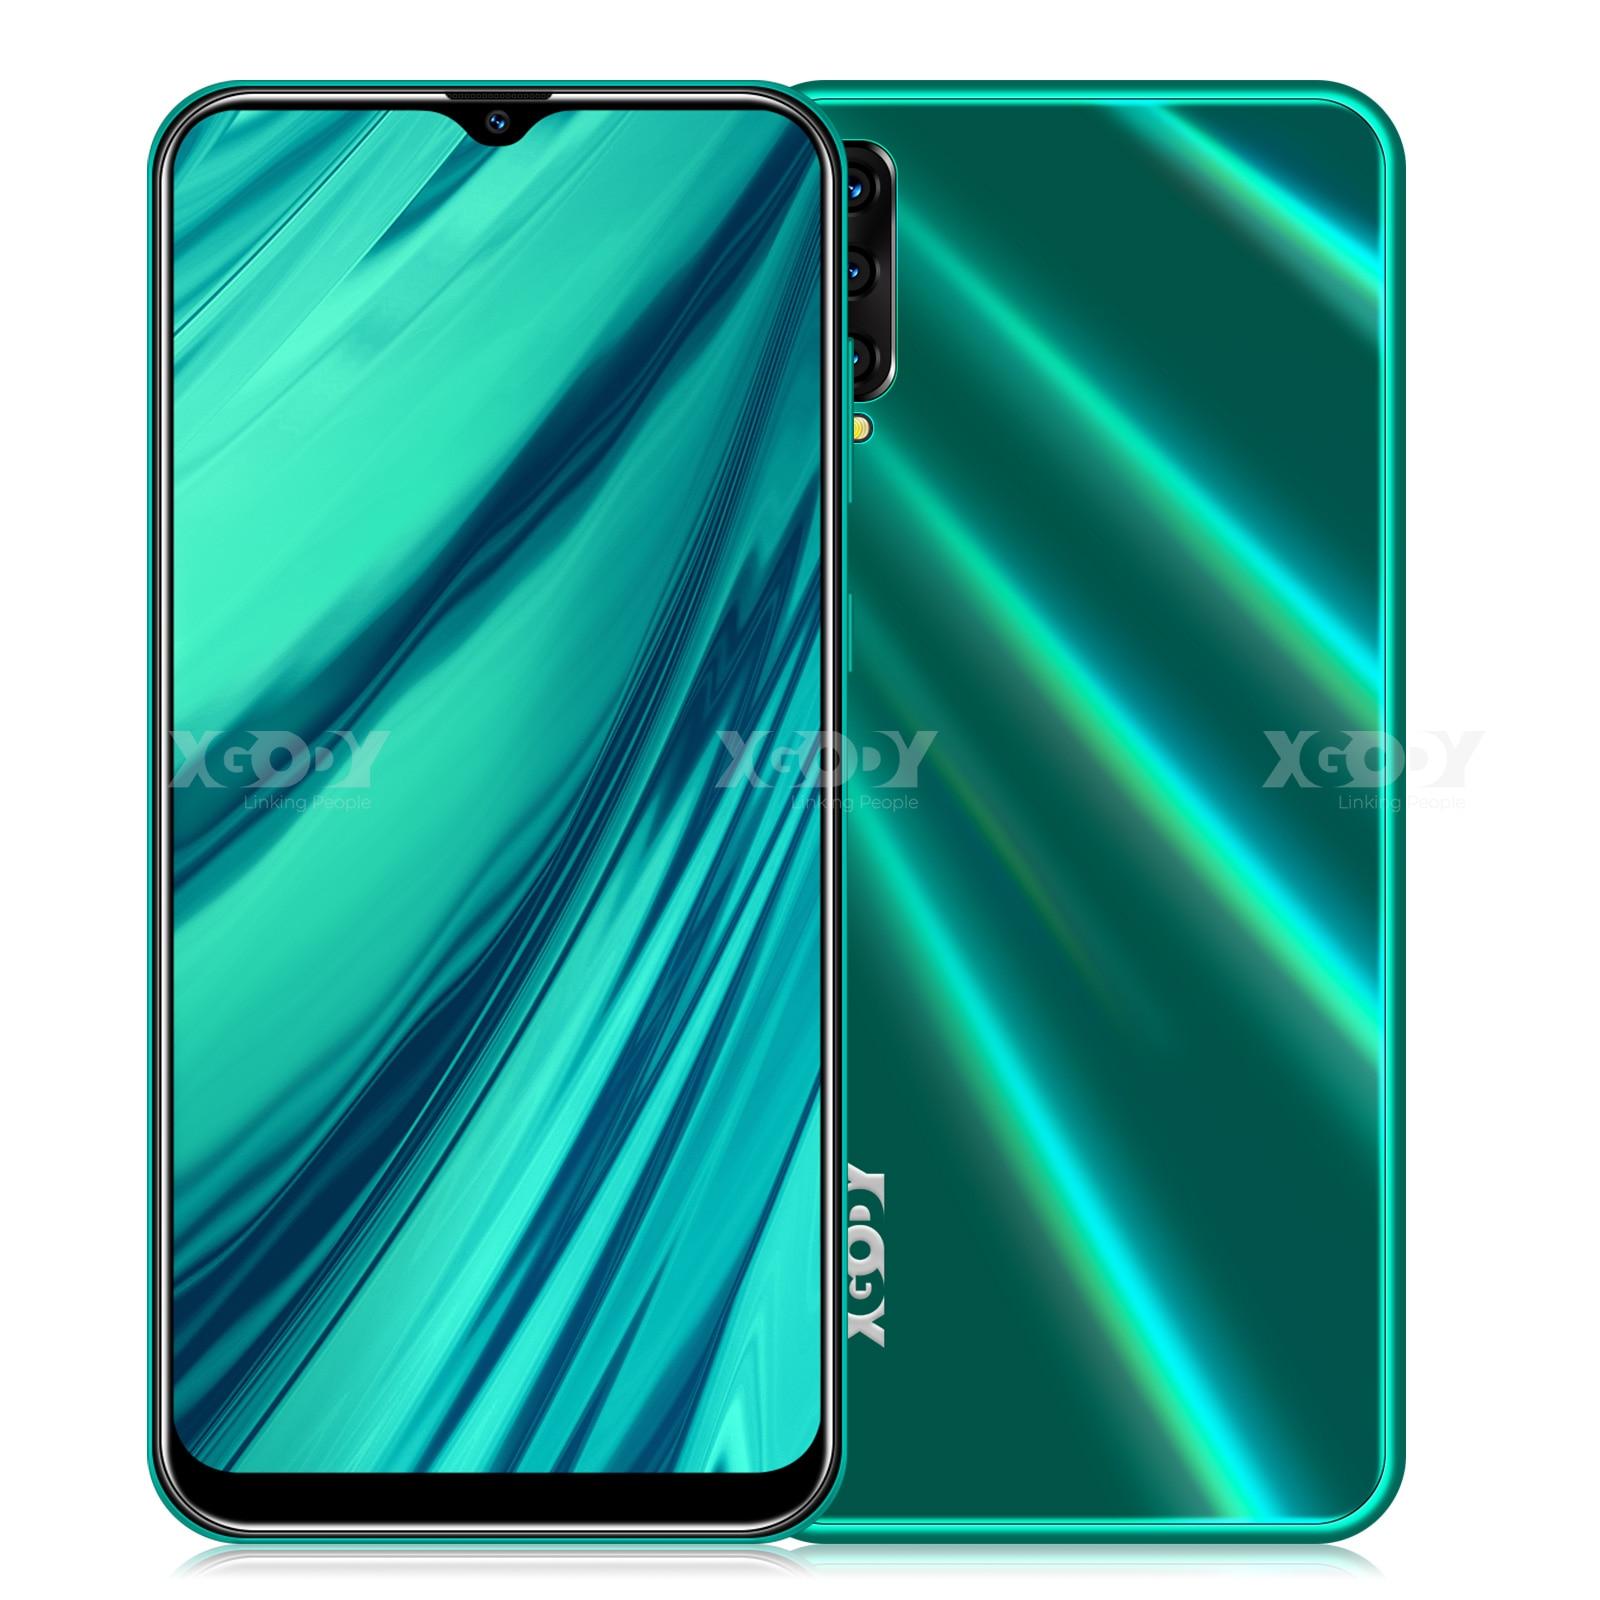 XGODY A90 3G Smartphone Android 9.0 6.5inch 19:9 Full Screen 2GB 16GB MTK6580 Quad Core 5MP Camera 2700mAh Mobile Phone